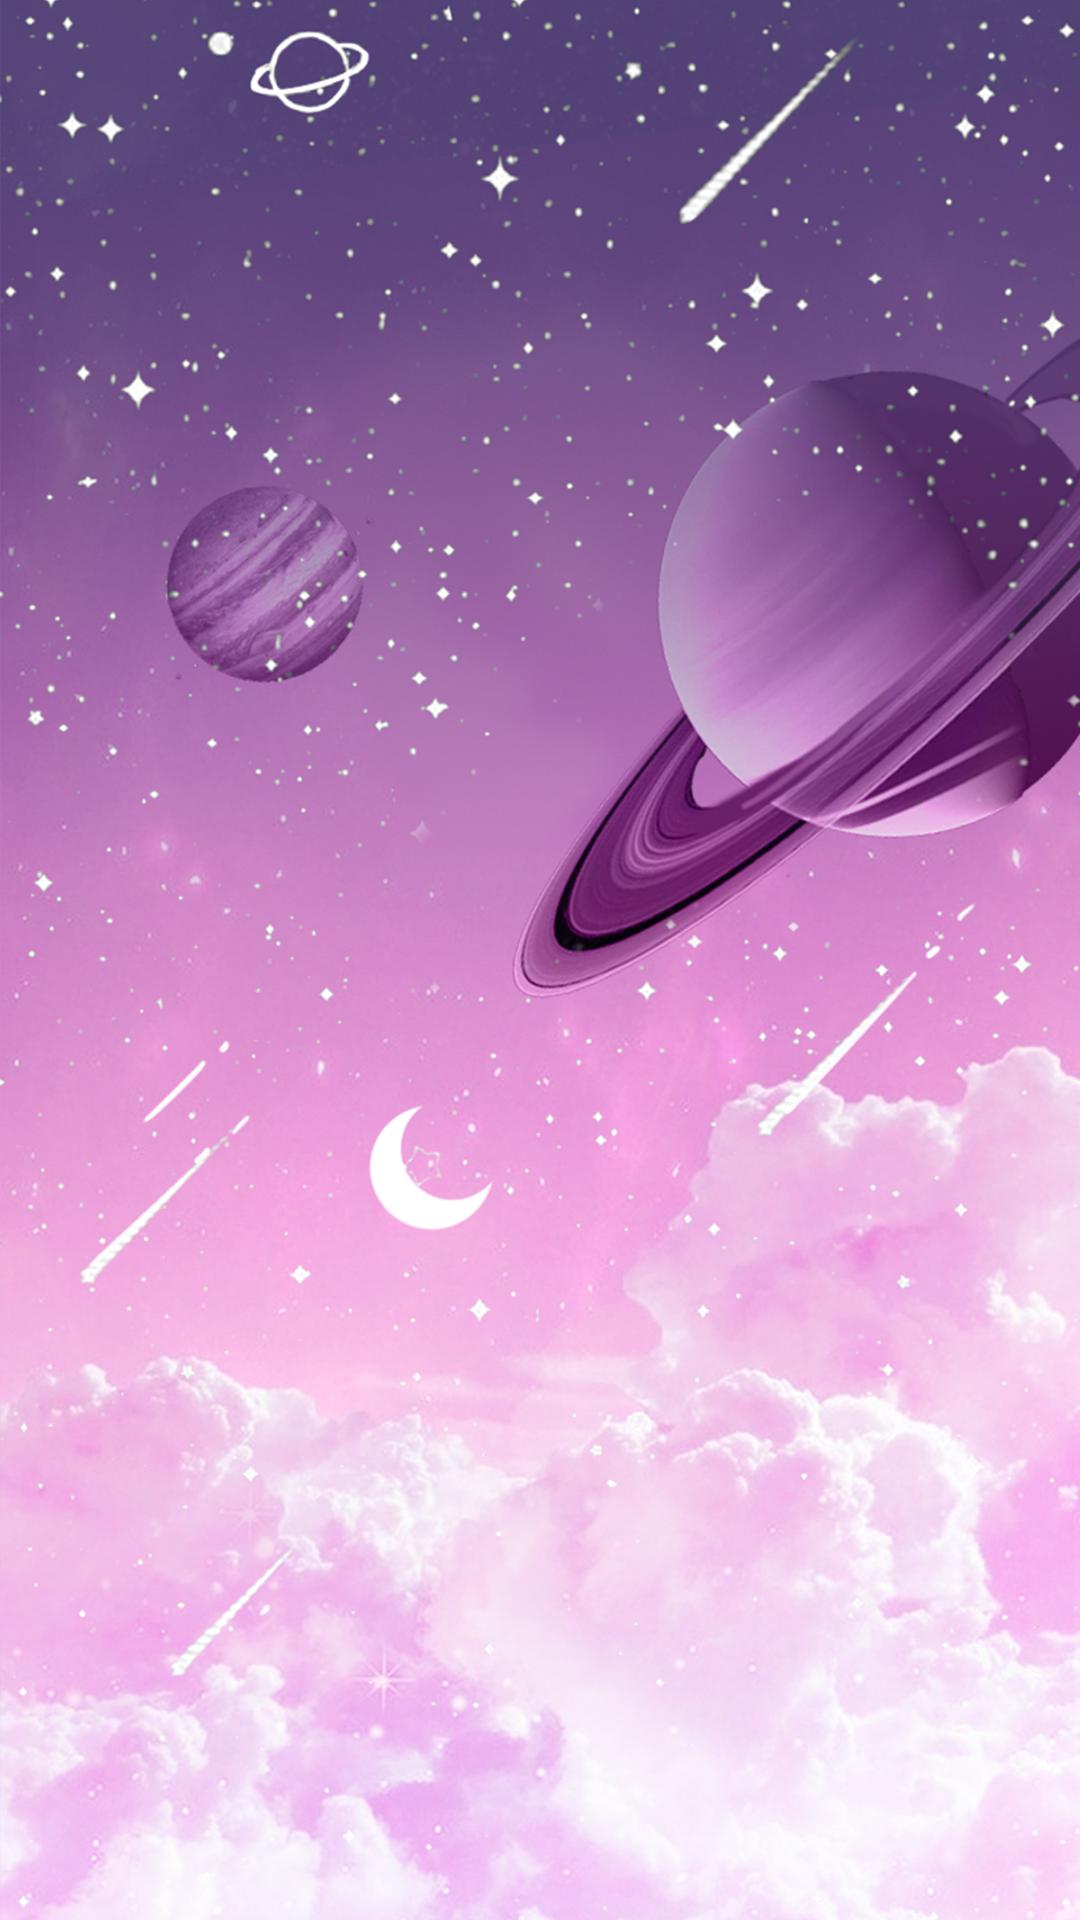 Wallpaper Universo Purple by Gocase